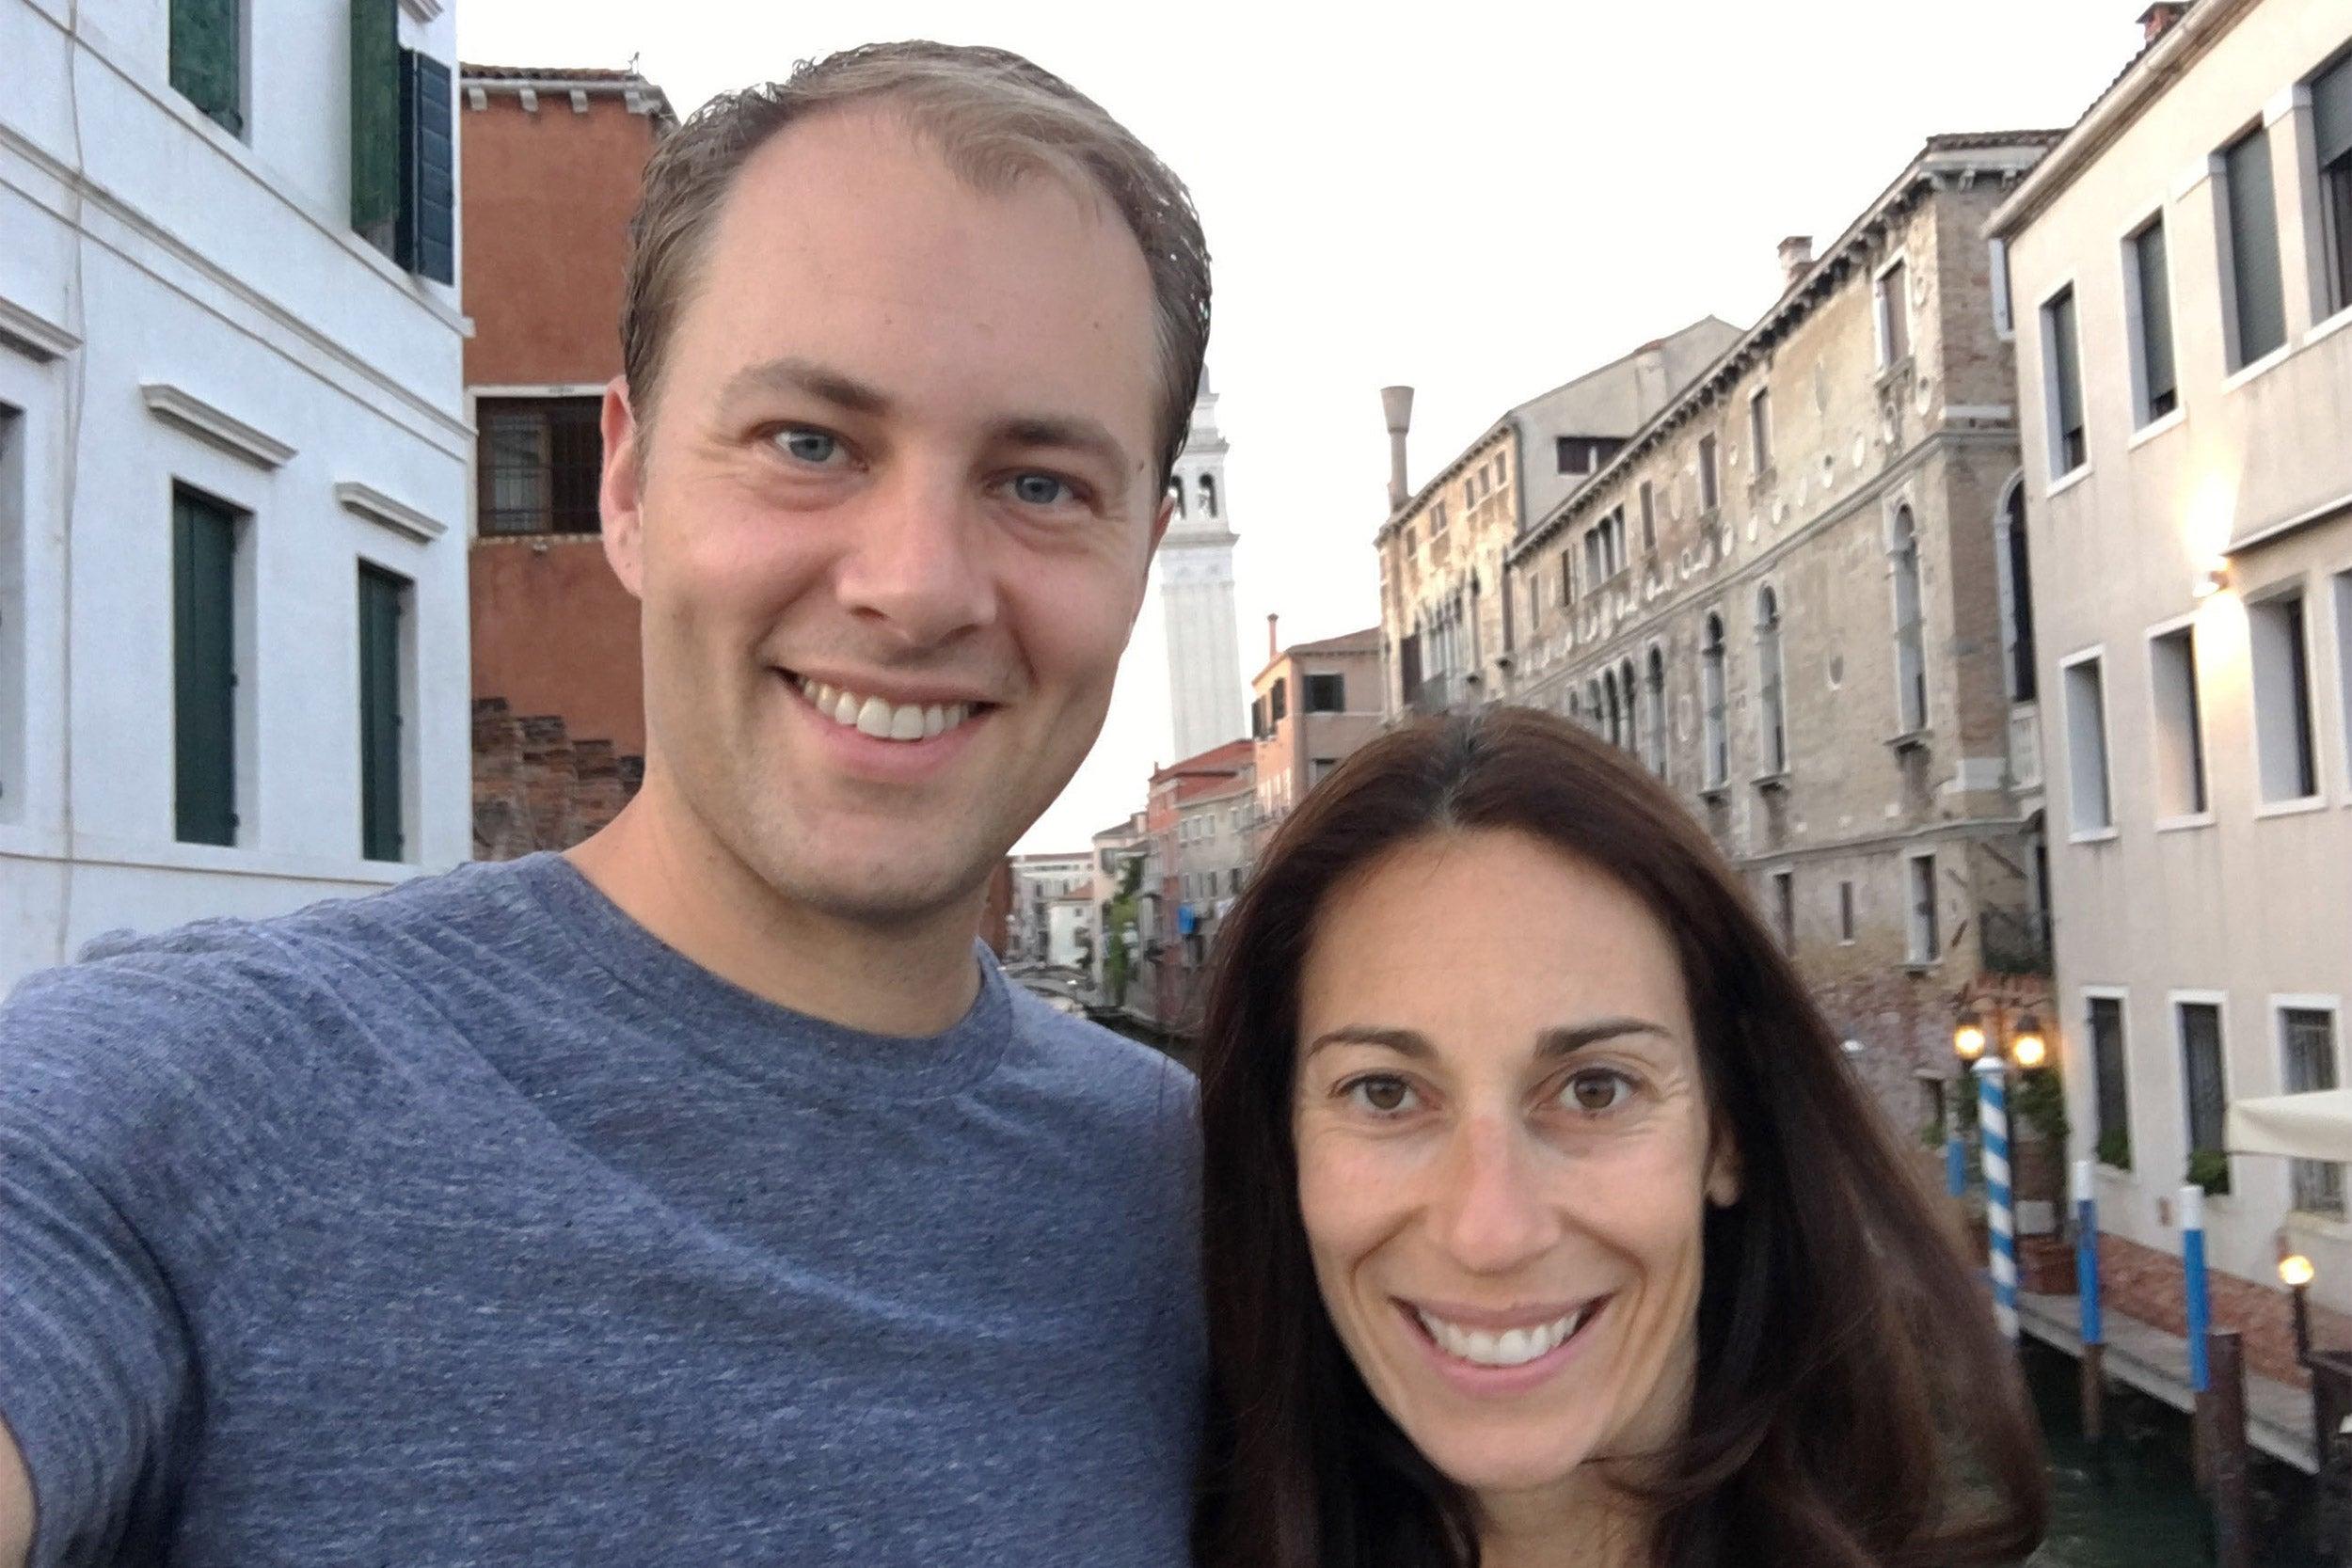 David Deming and Janine Santimauro.